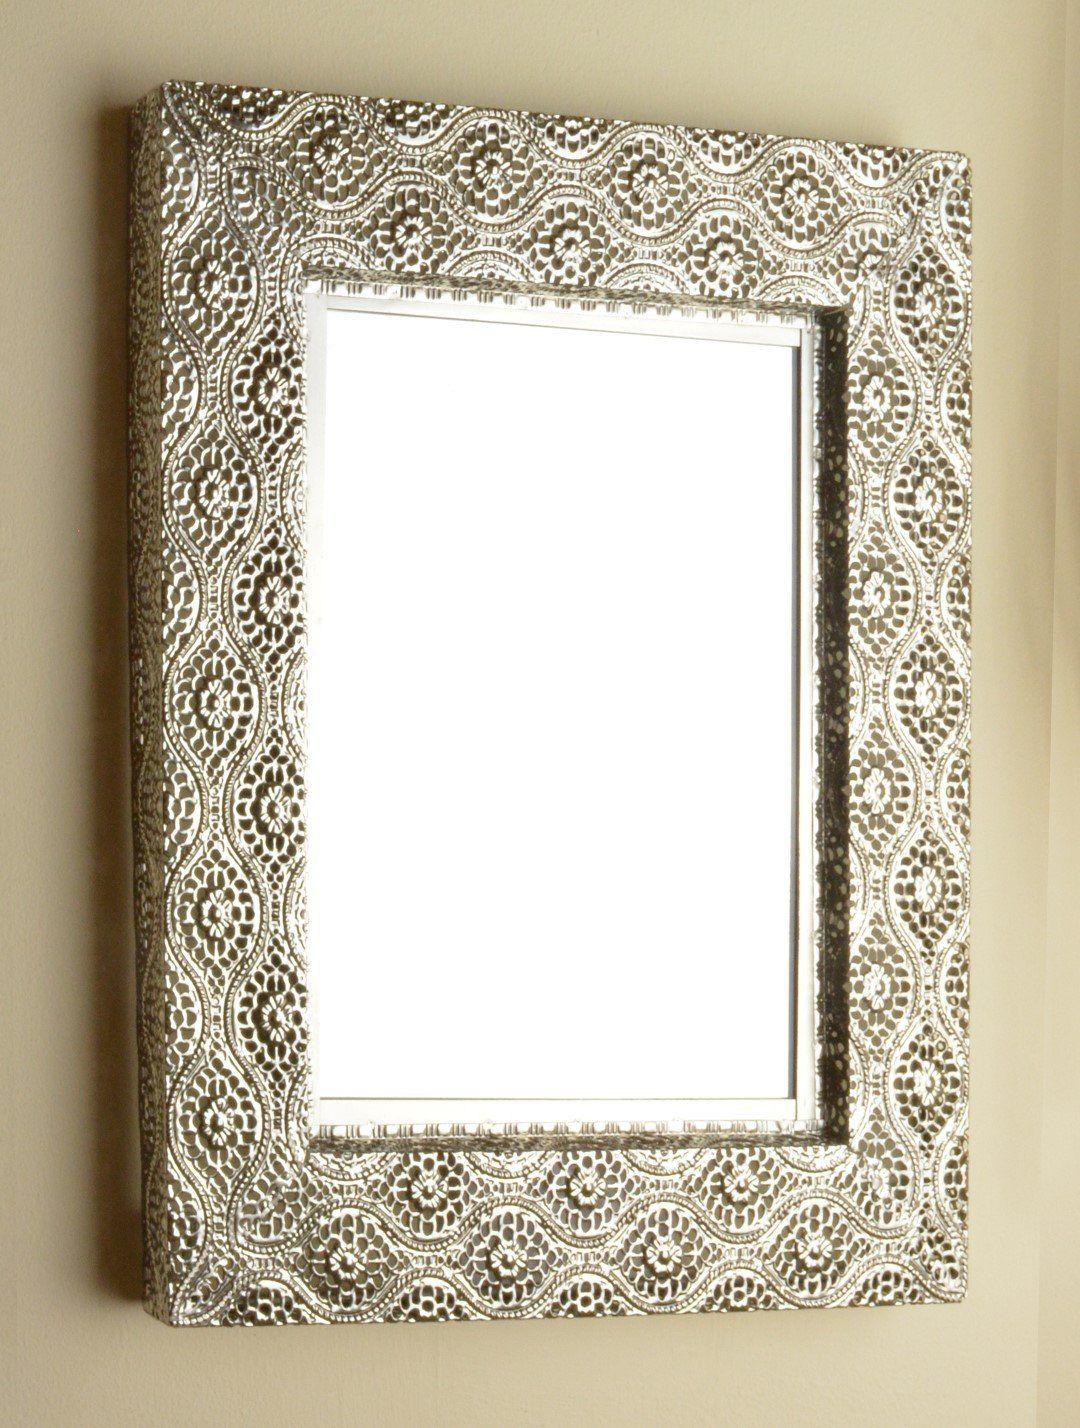 Miroir Dans Un Style Marocain Mirror Home Homedecor Decoration